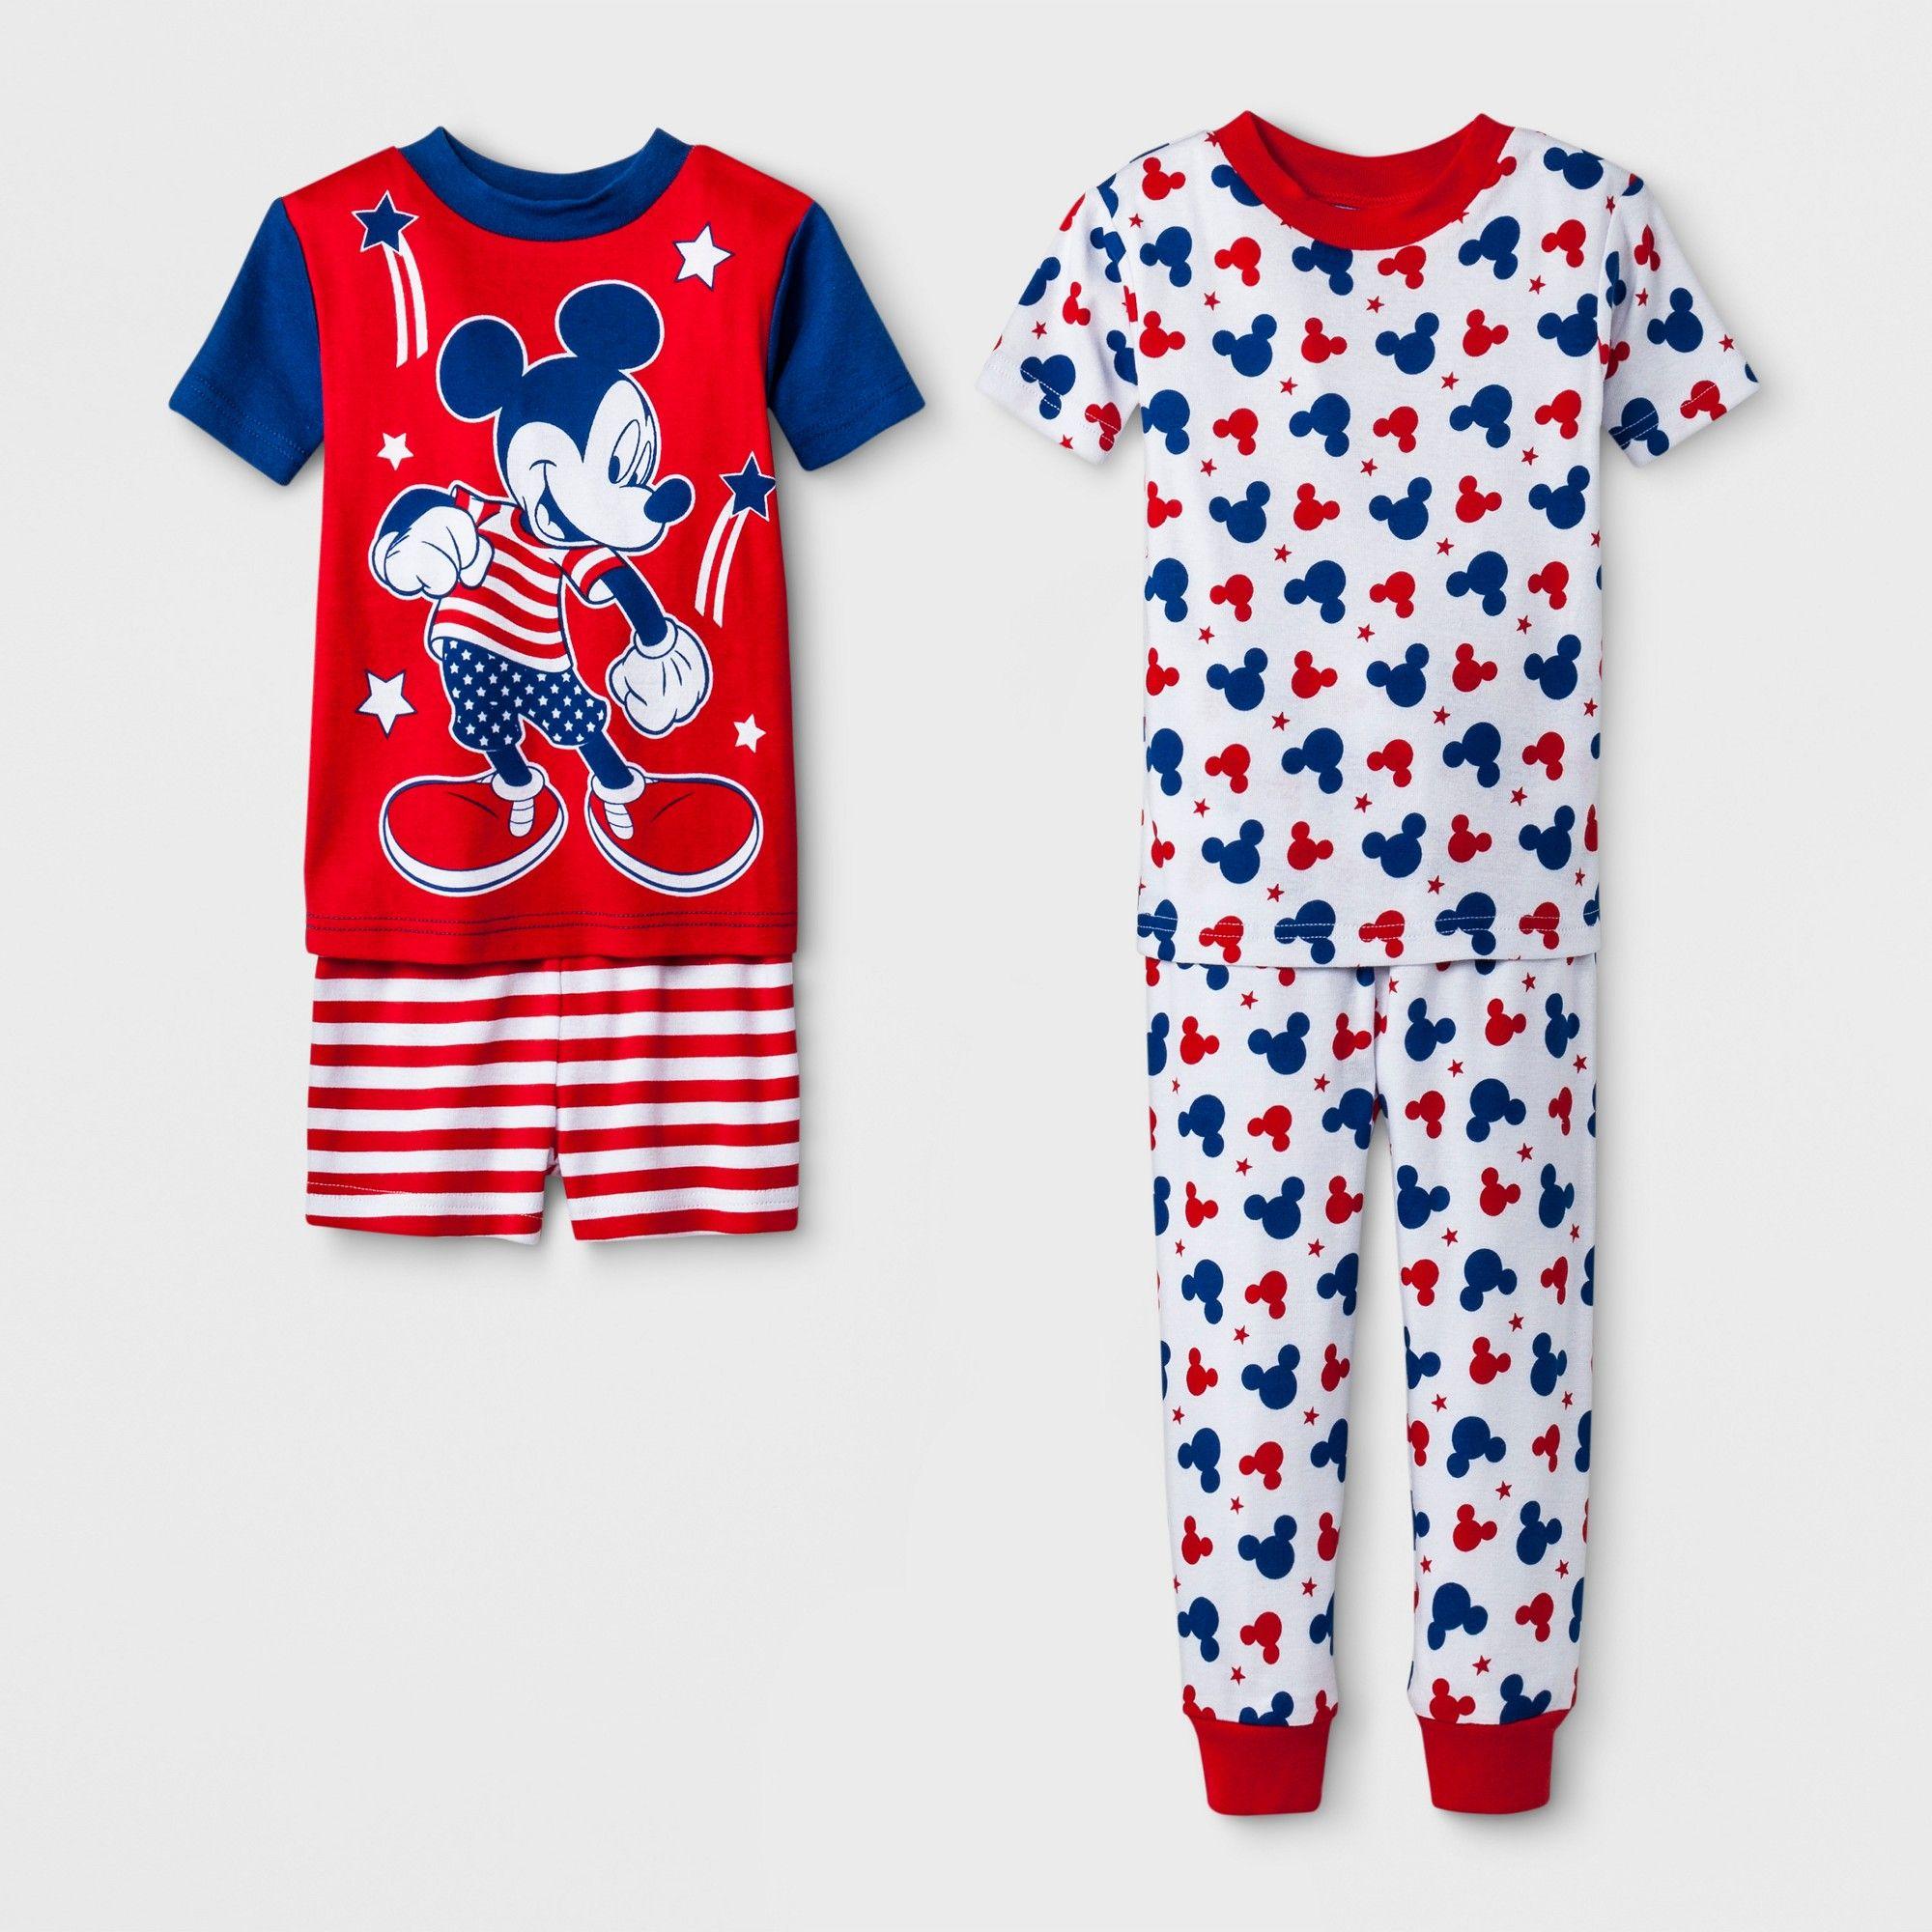 808da4990 Toddler Boys  Mickey Mouse 4pc Pajama Set - Red 2T